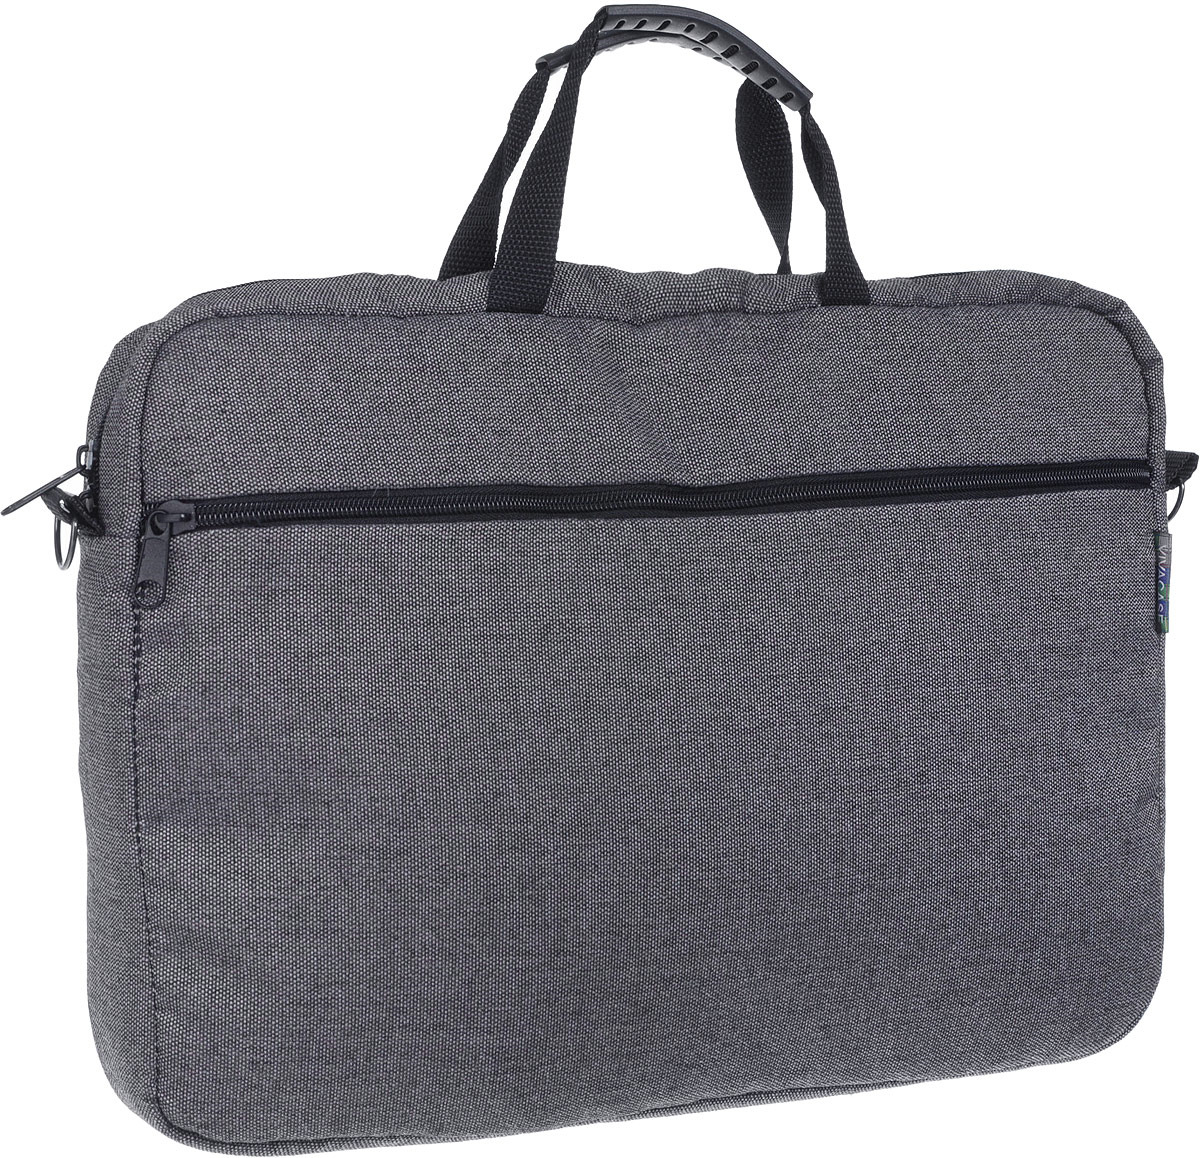 "Vivacase Event, Gray сумка для ноутбука 15.6"""